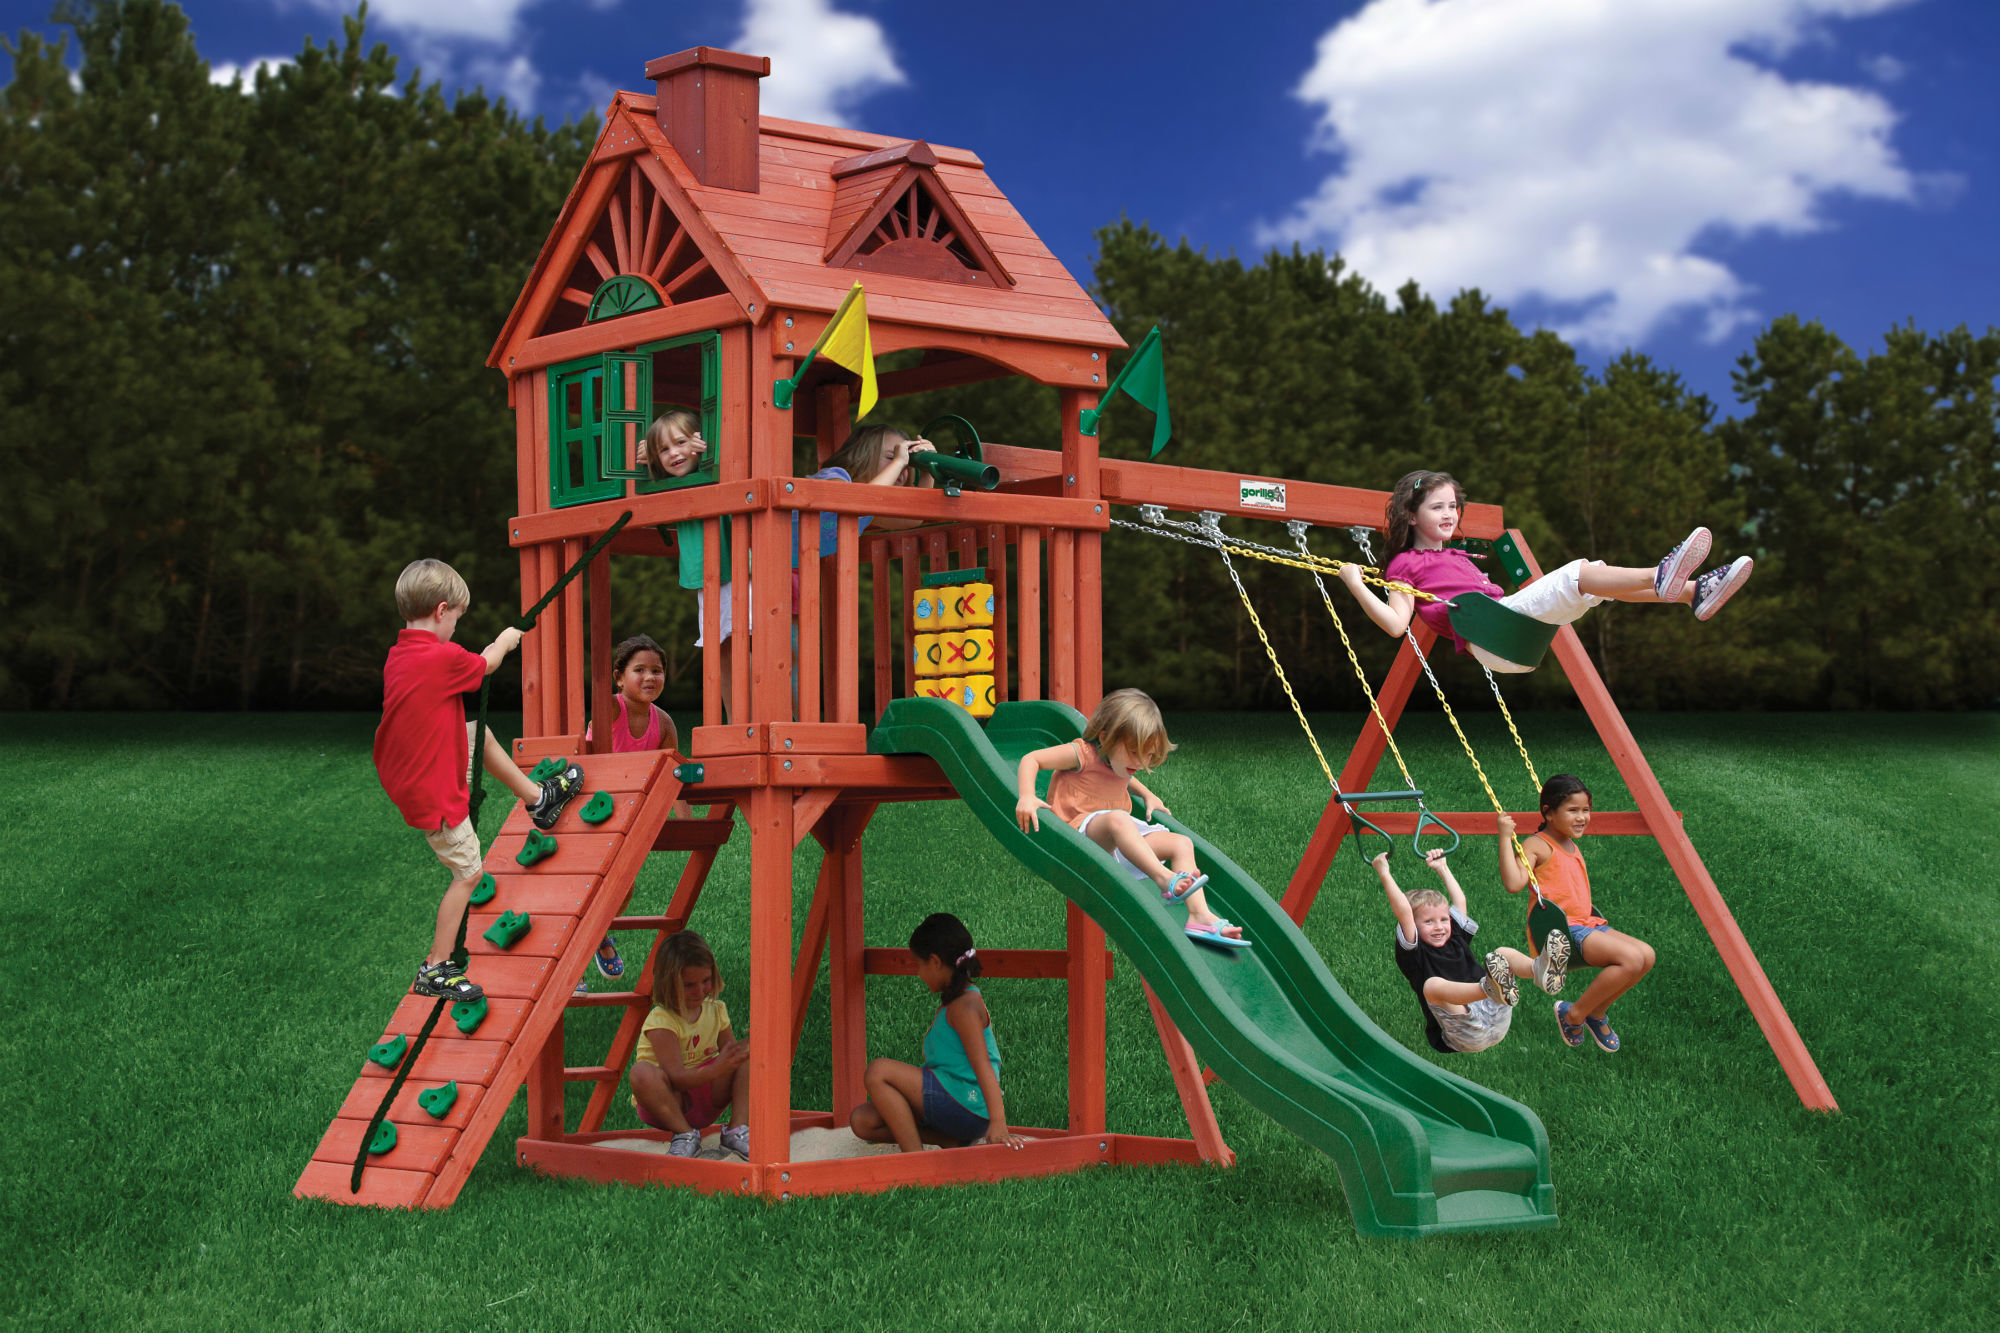 Discount Playground Supply image 2